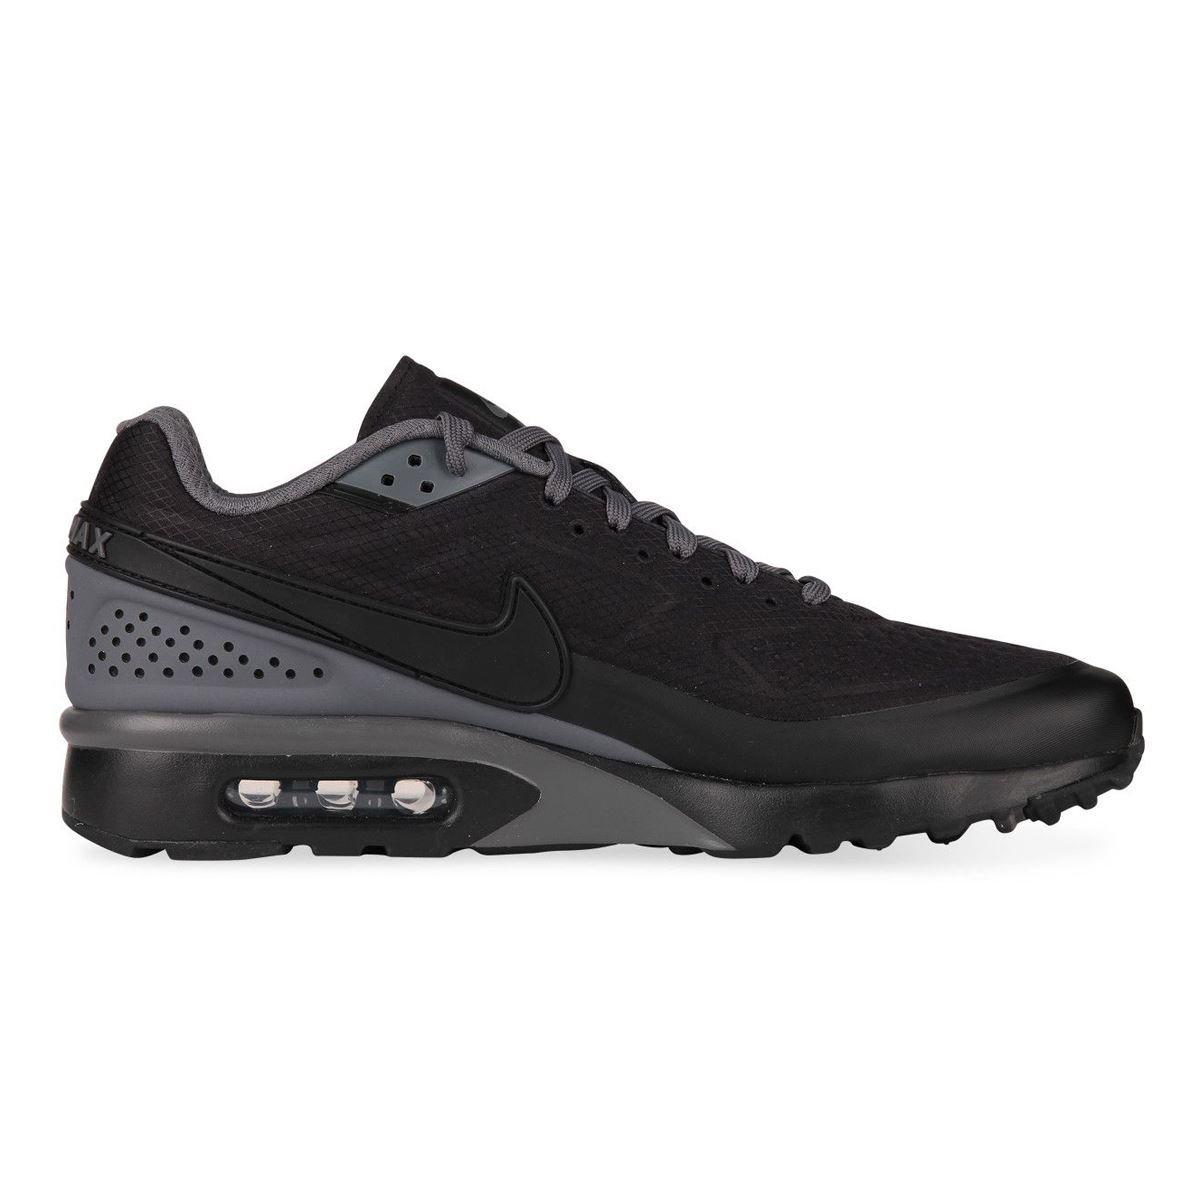 d88a27b9dc Amazon.com: Nike Mens Air Max BW Ultra SE Running Shoes Black/Dark Grey  844967-002 Size 11.5: Sports & Outdoors